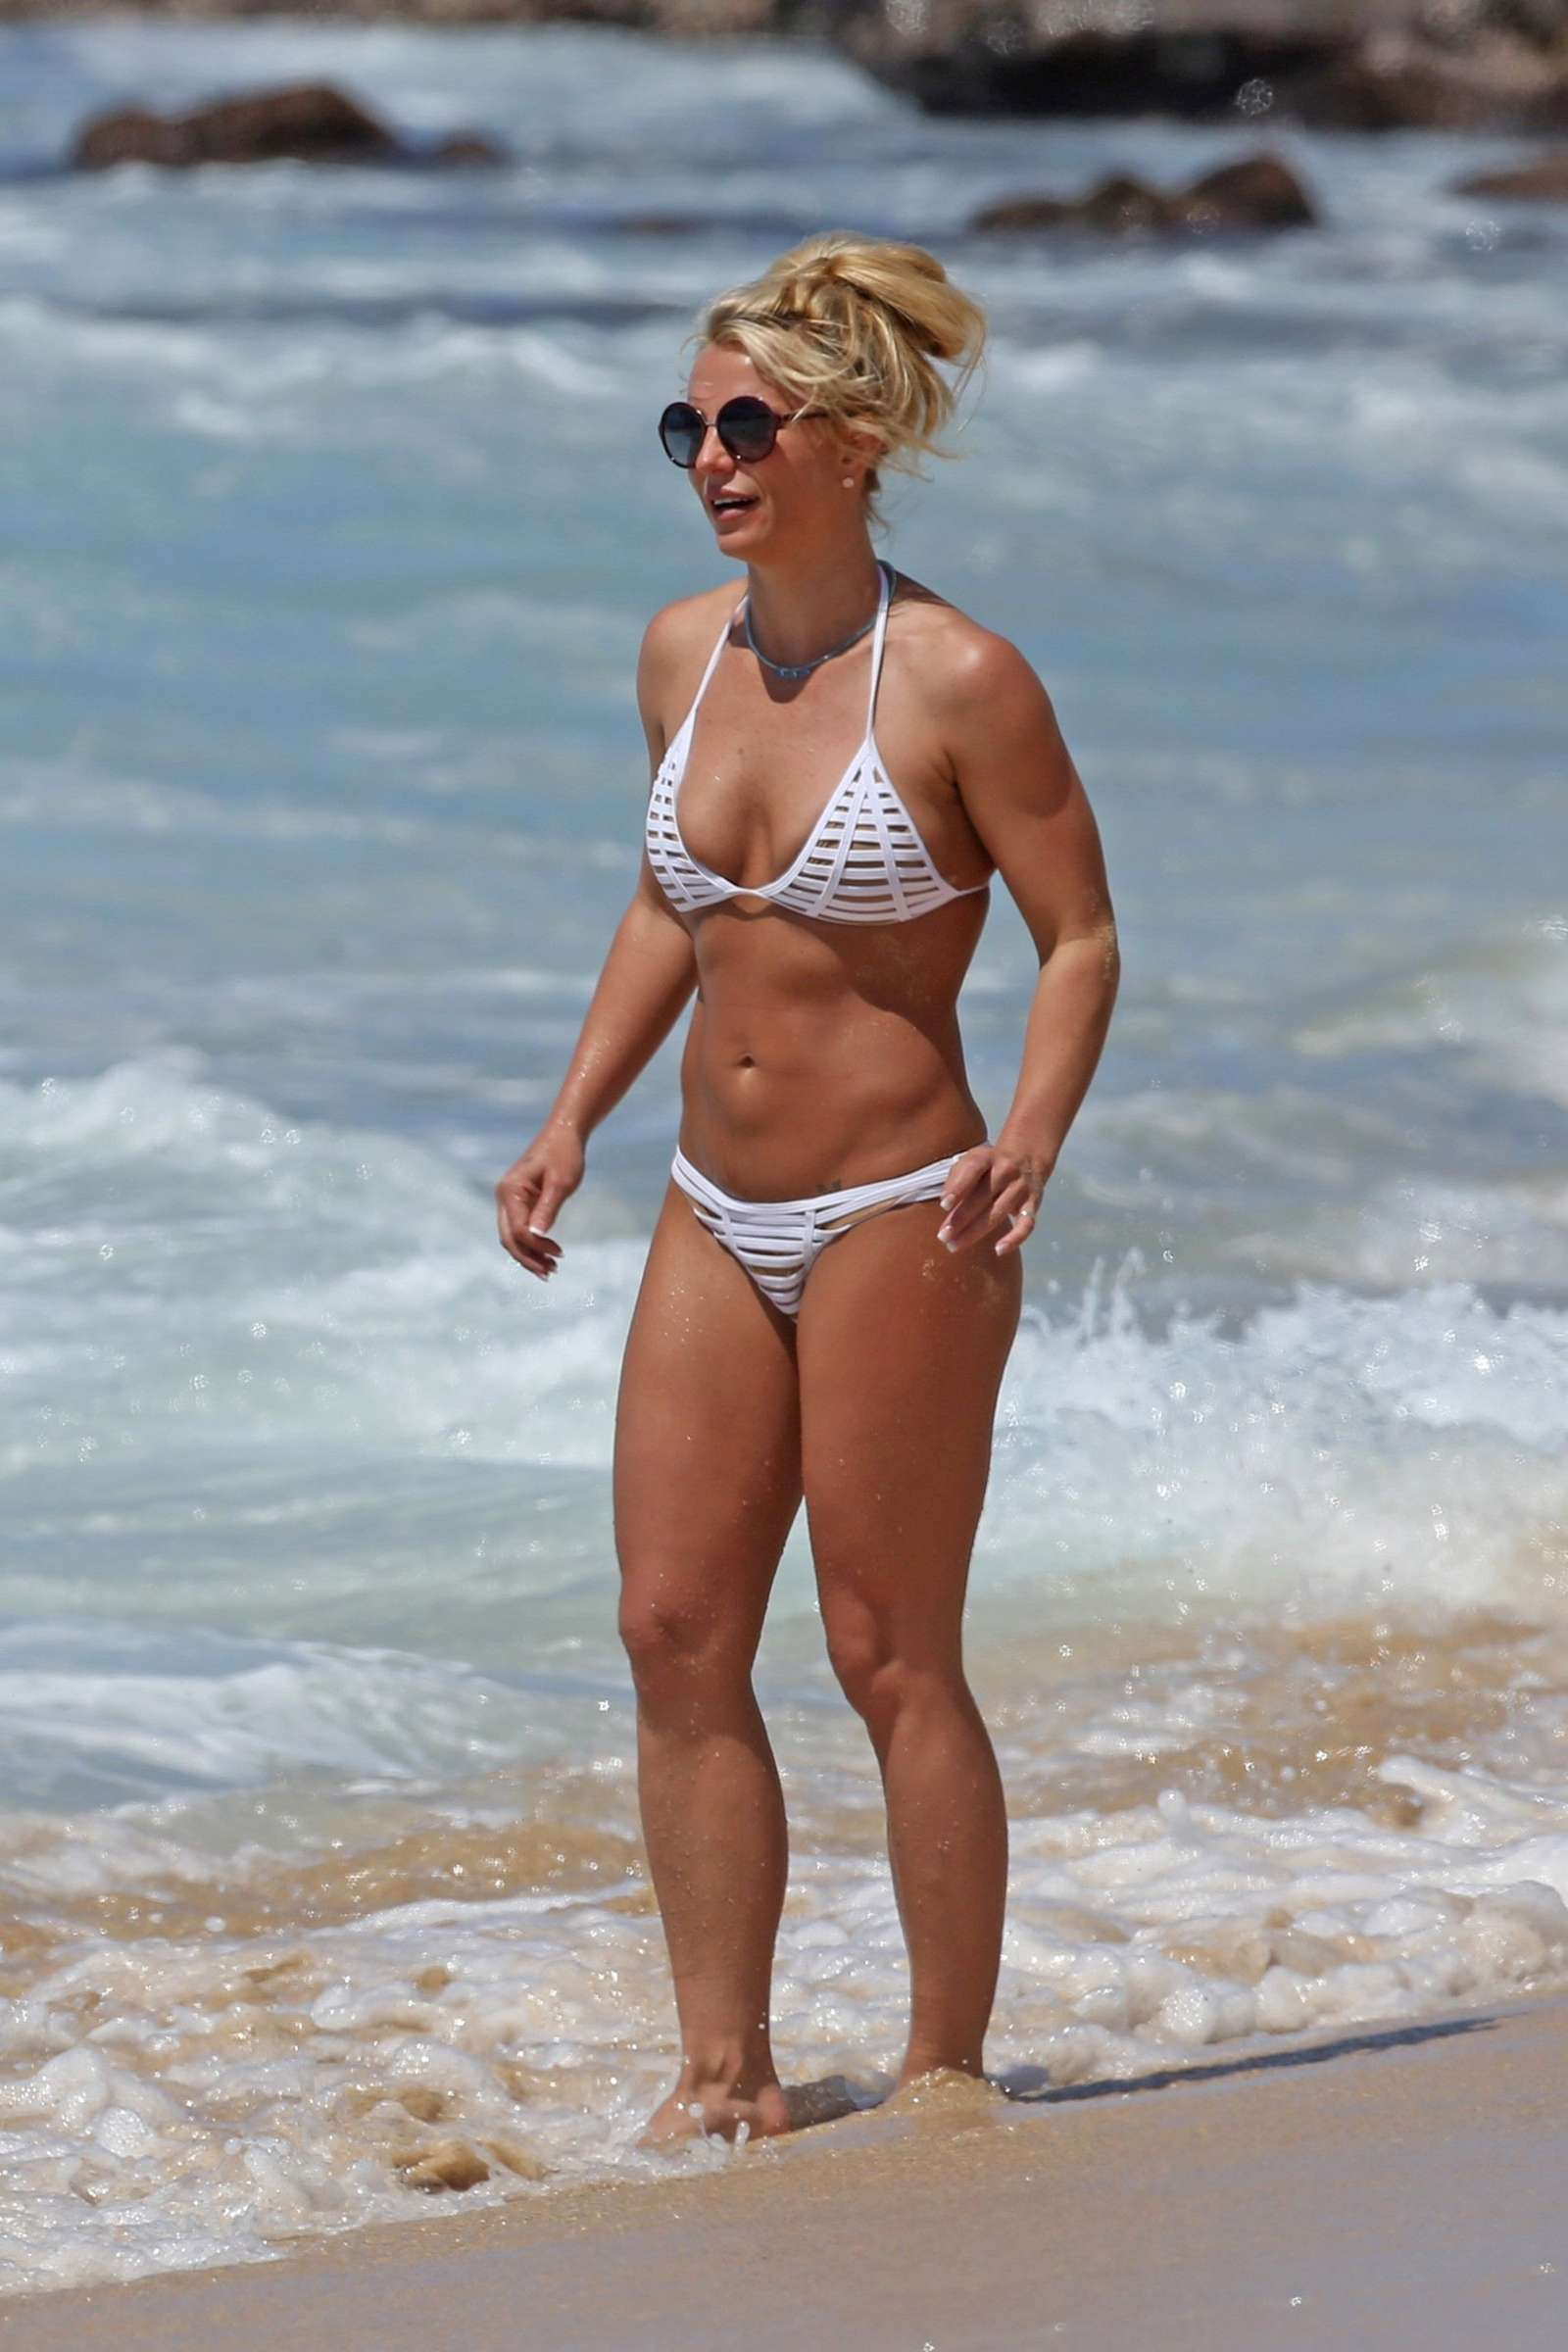 britney spears in white bikini on the beach in hawaii | celebs